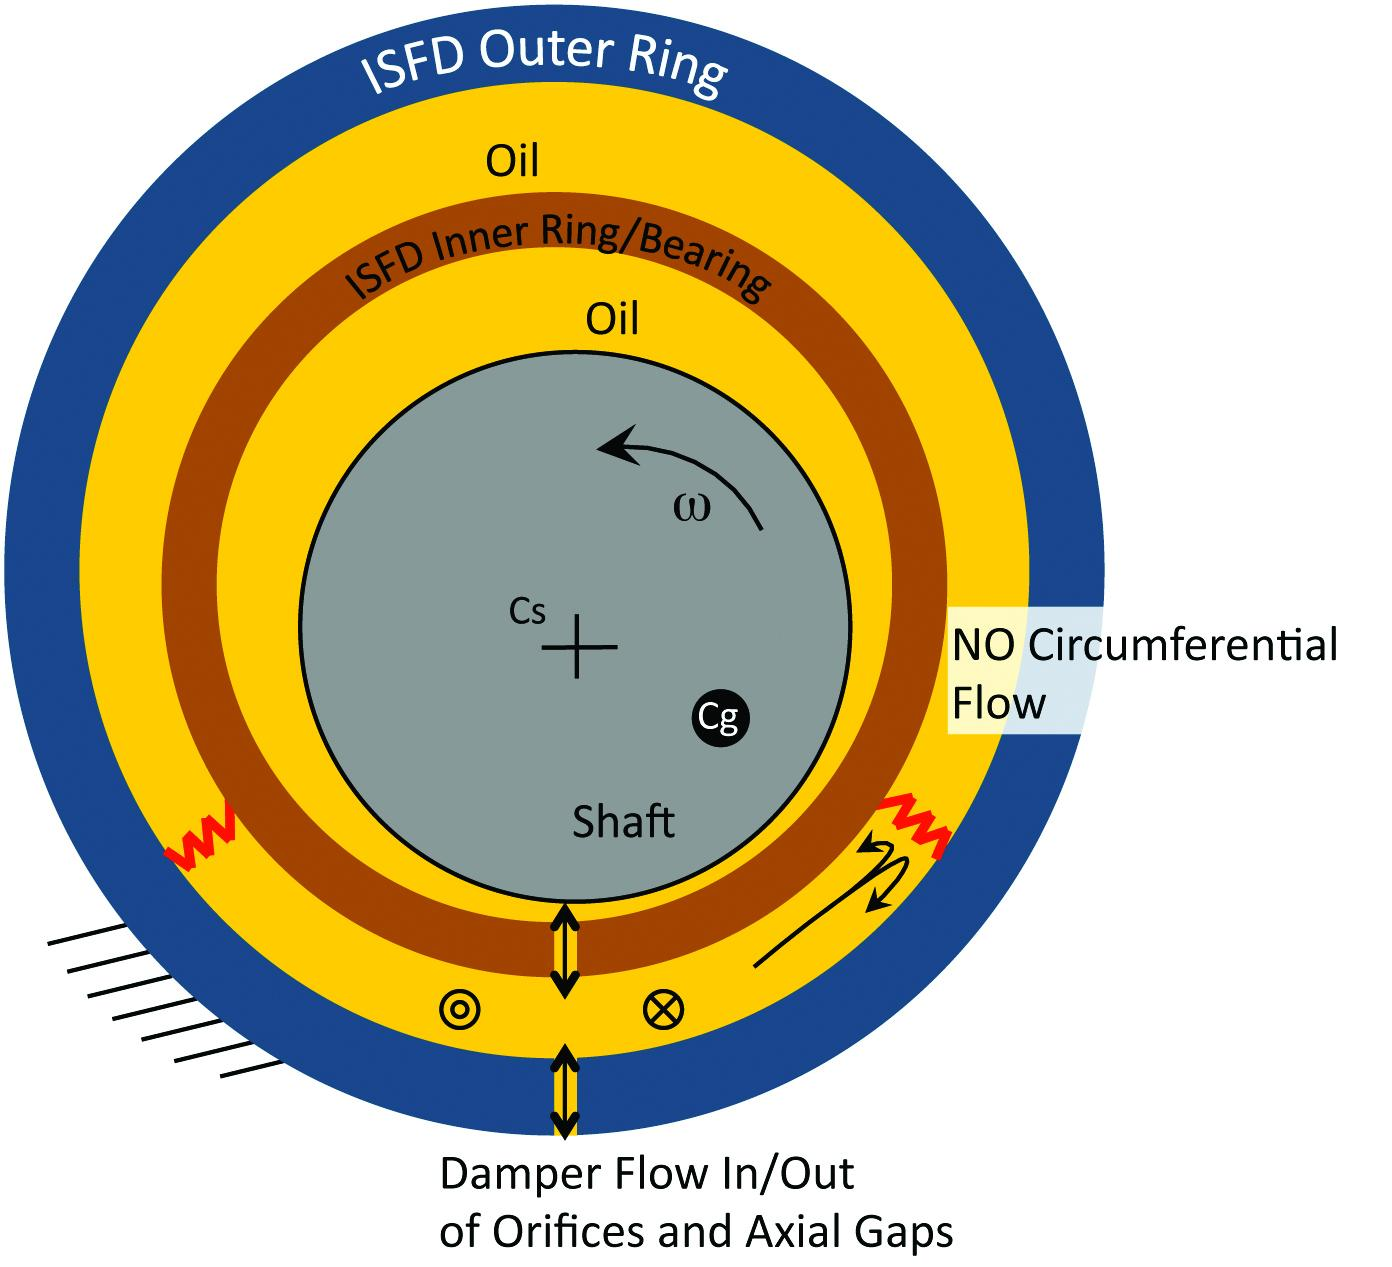 Fig. 2. ISFD Design